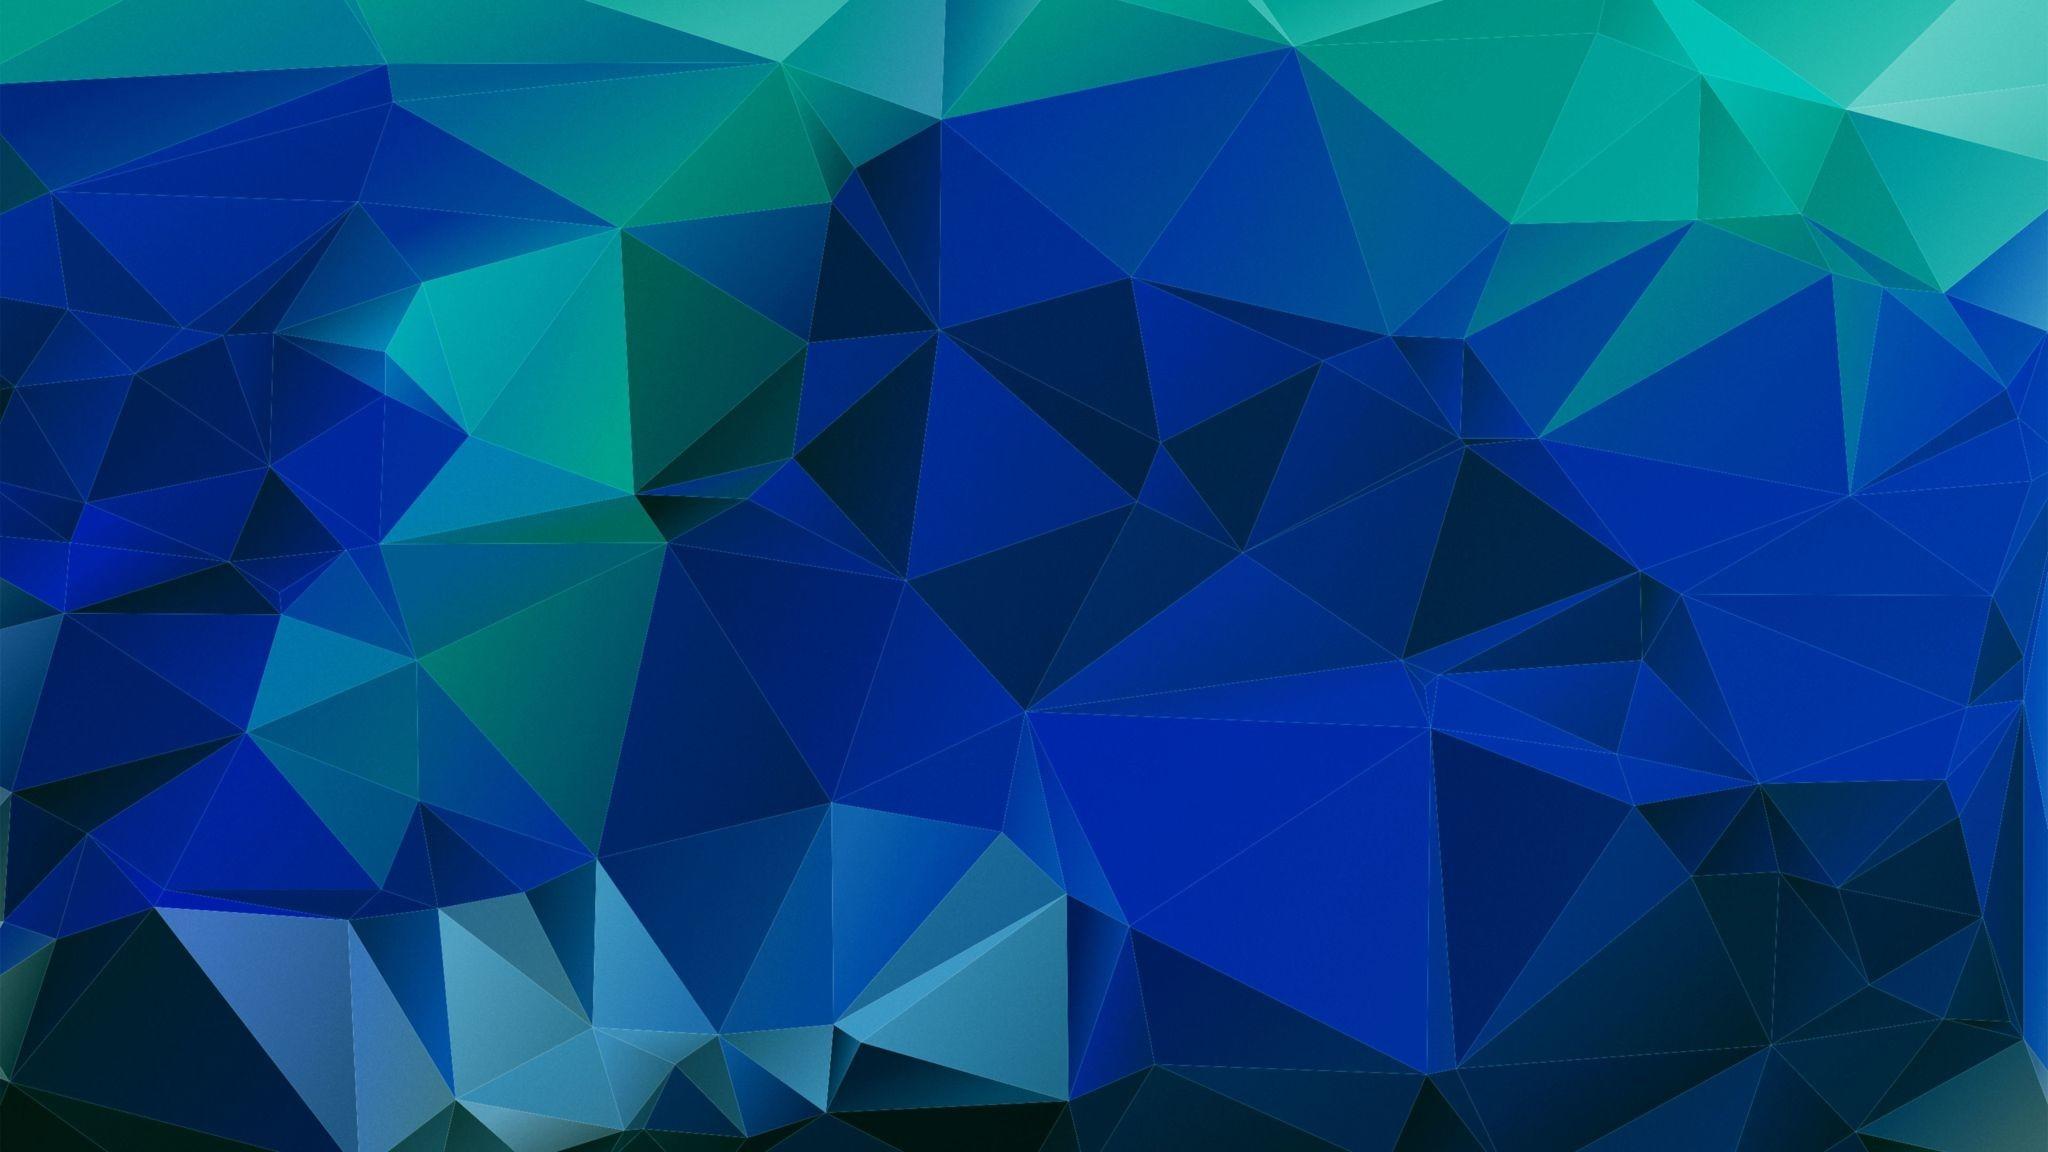 Geometric Animal Wallpaper 74 Images: Cool Geometric Wallpaper (74+ Images